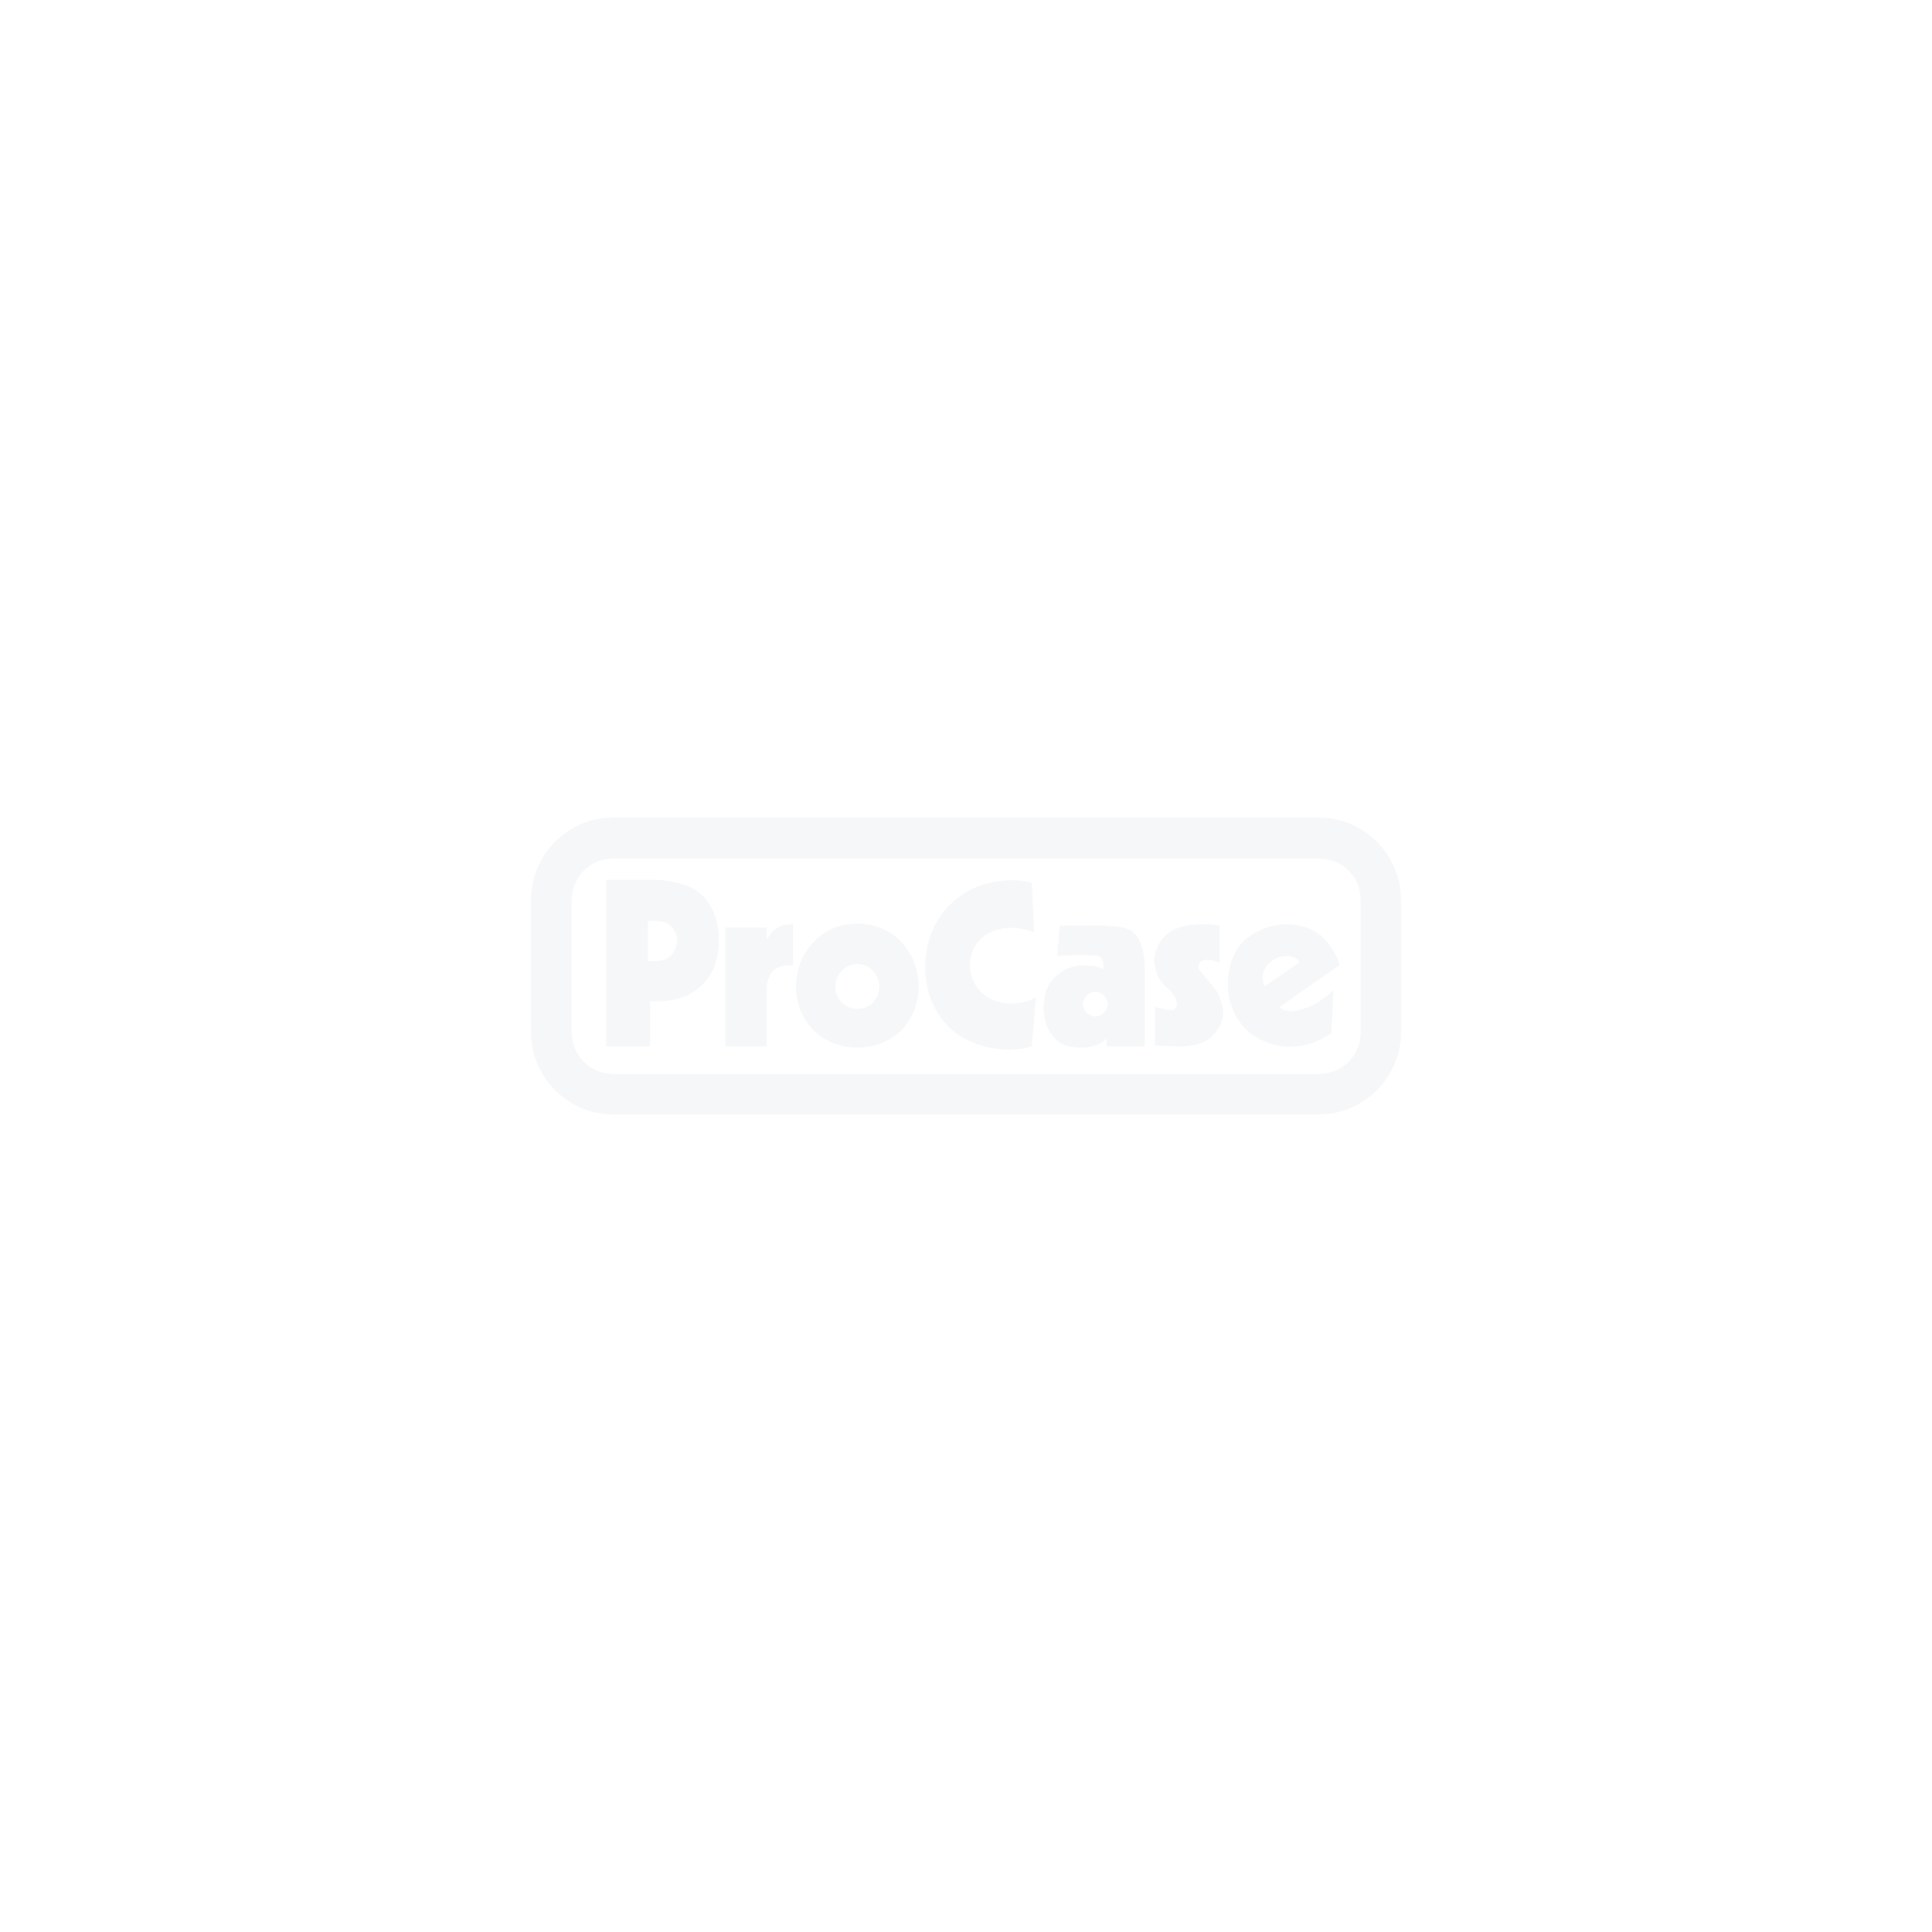 Transportcase Vario-Flex 60 Plus 750 mm hoch 2